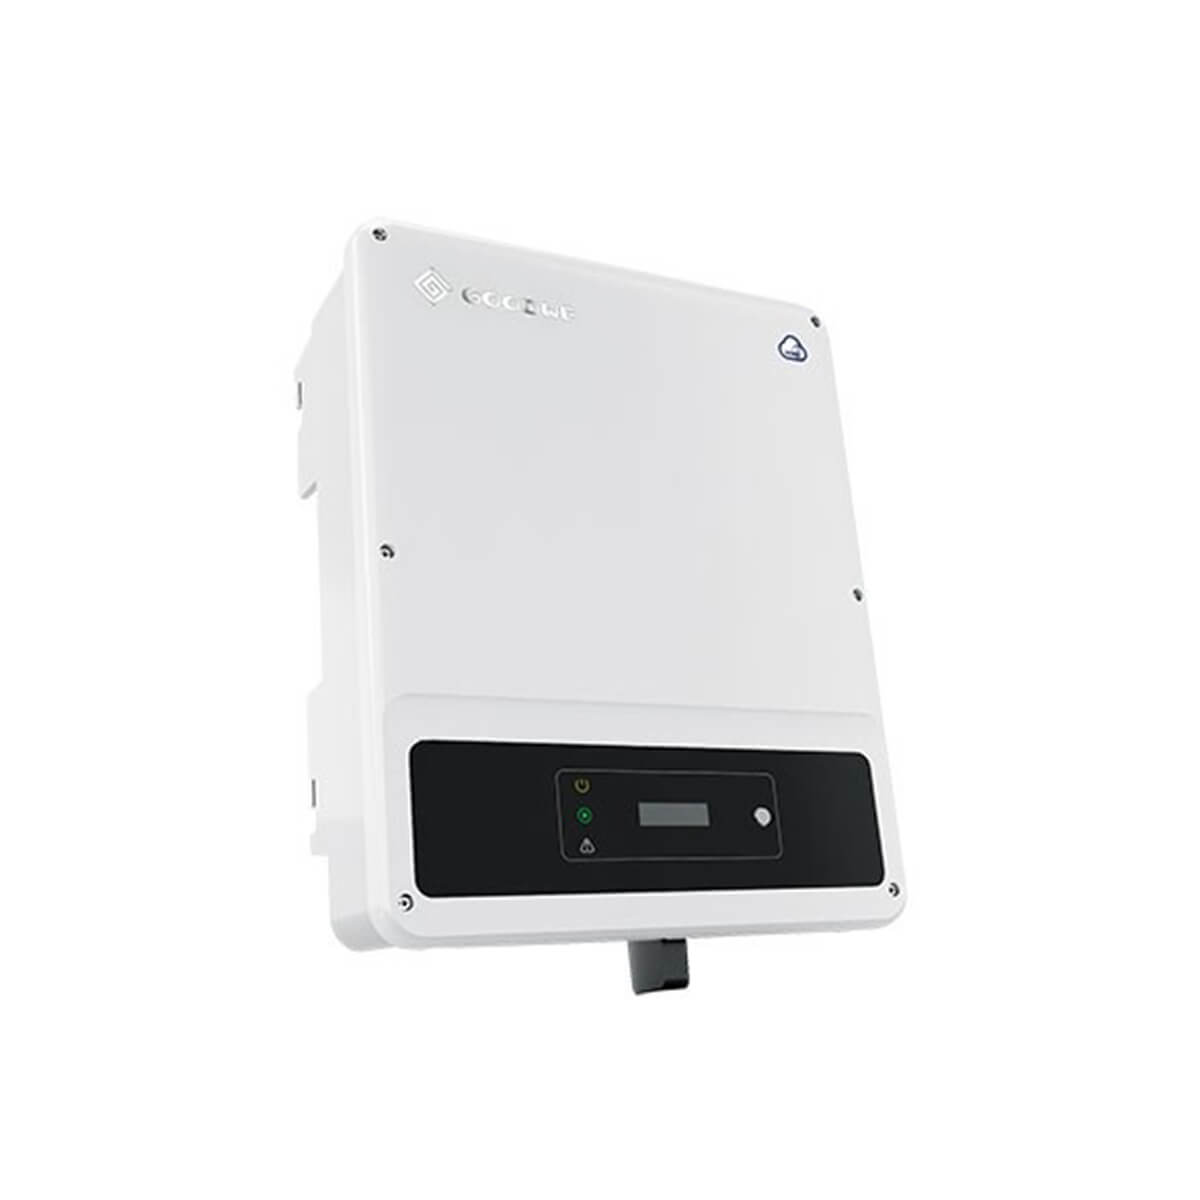 goodwe 5kW inverter, goodwe gw5000d-ns 5kW inverter, goodwe gw5000d-ns inverter, goodwe gw5000d-ns, goodwe 5 kW, GOODWE 5 KW